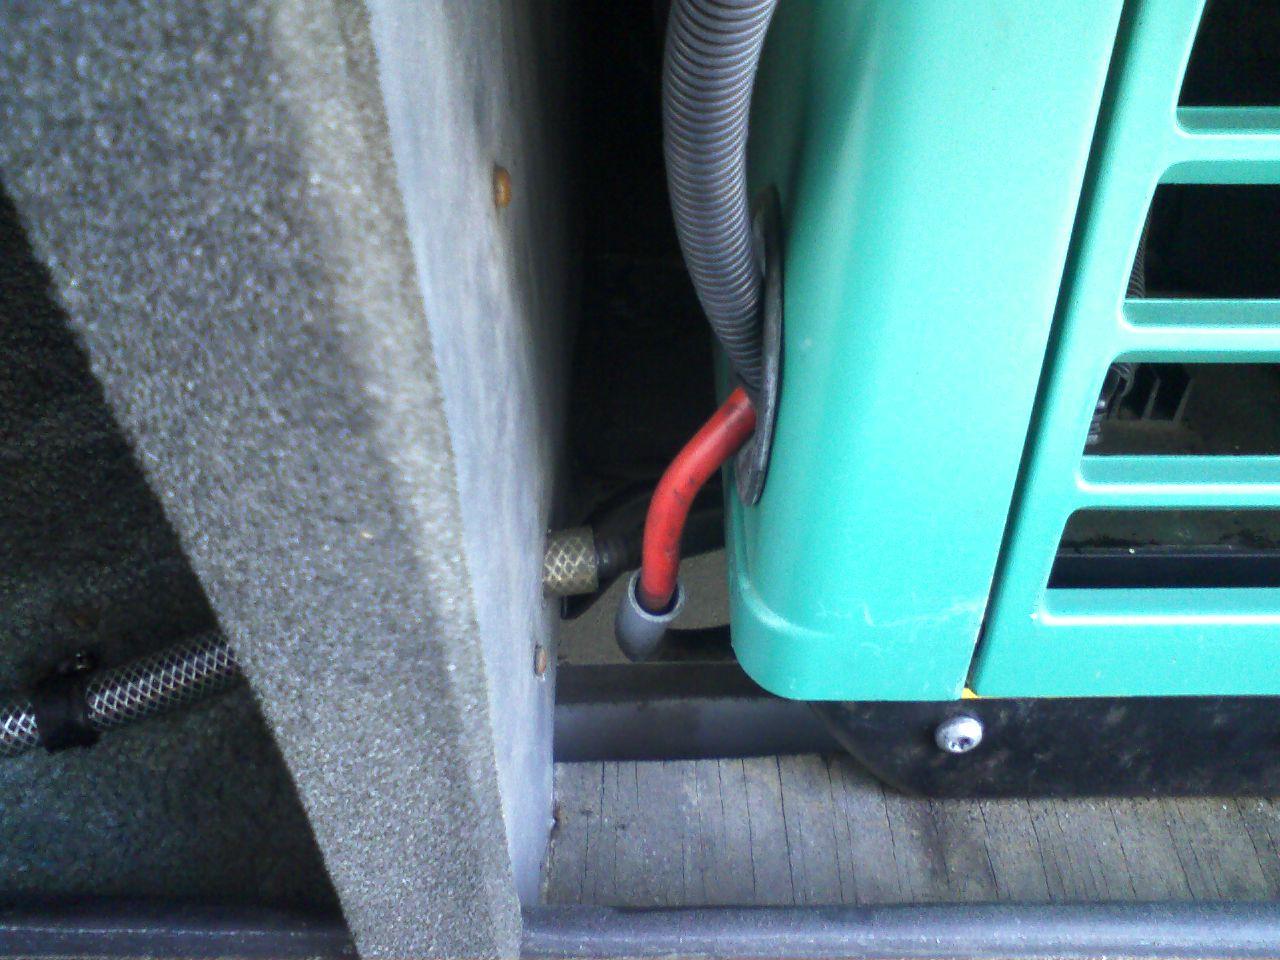 Click image for larger version  Name:Genset Cooling Air Intake.jpg Views:113 Size:183.2 KB ID:123468